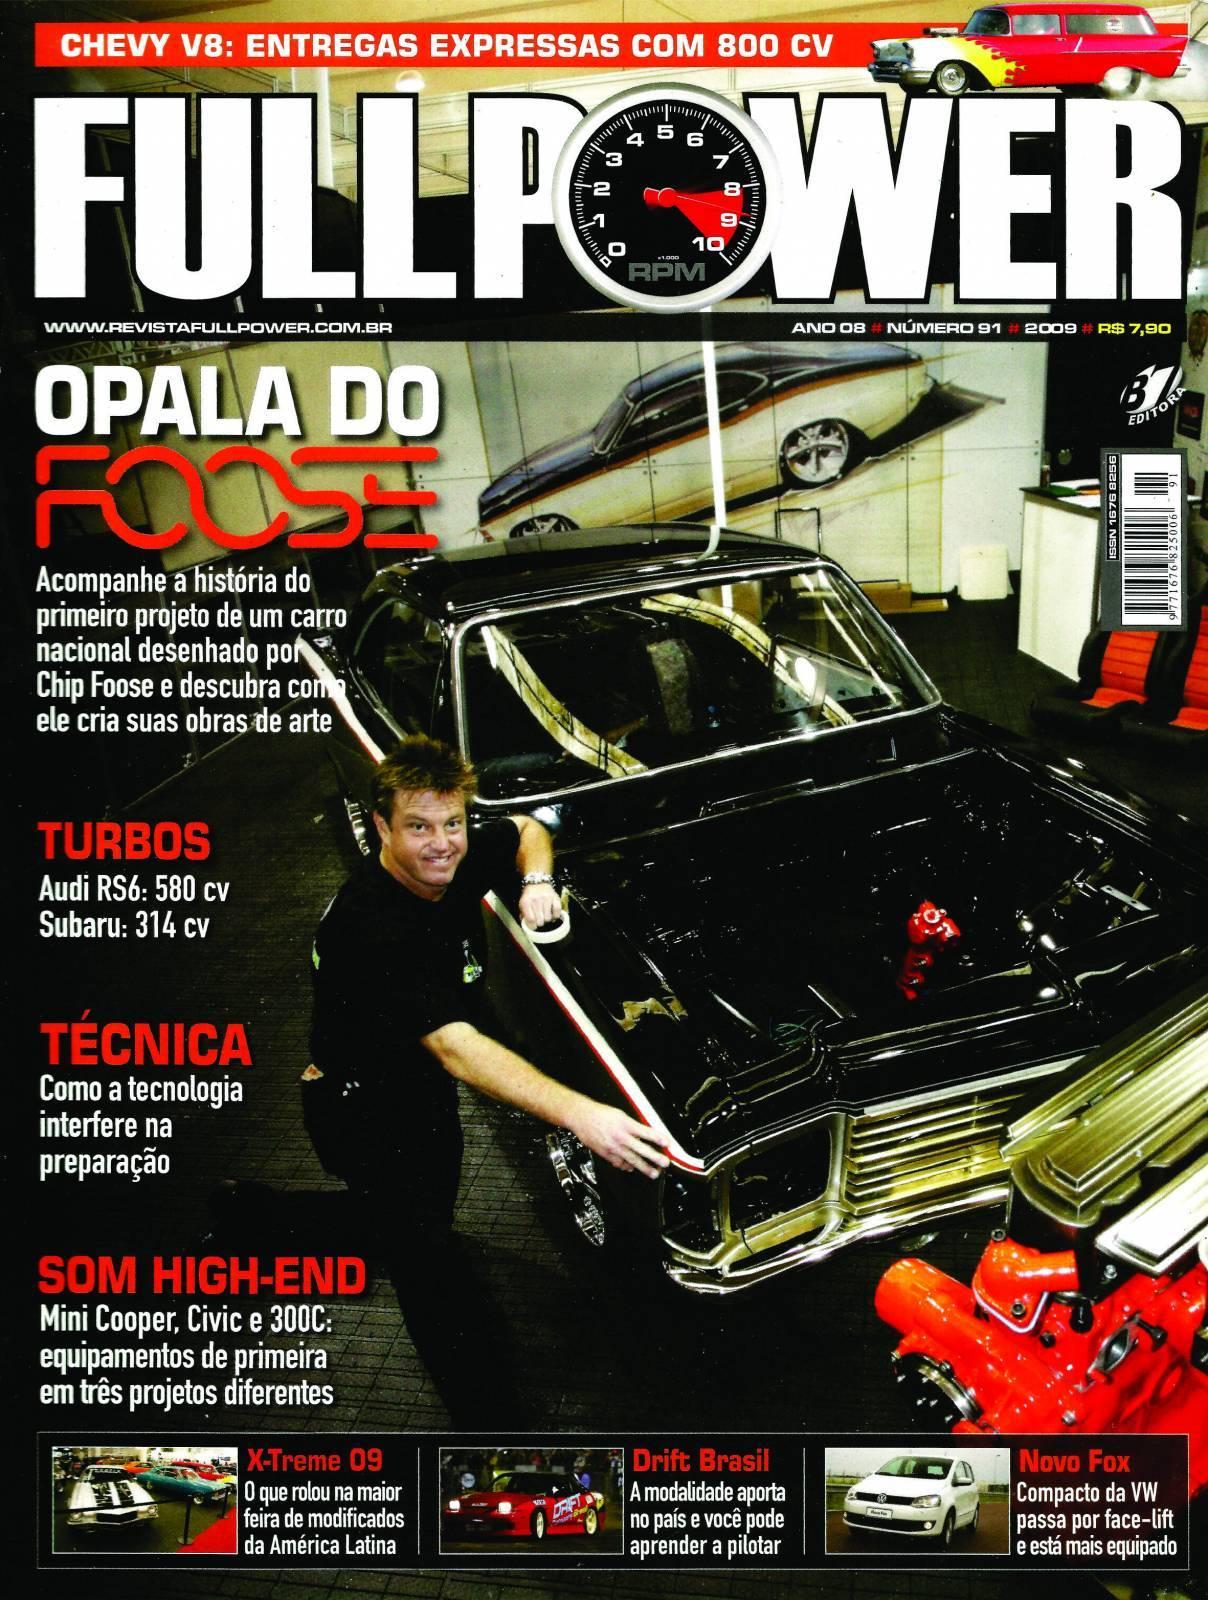 REVISTA FULLPOWER No. 91 ANO 2009 - Loja FullPower